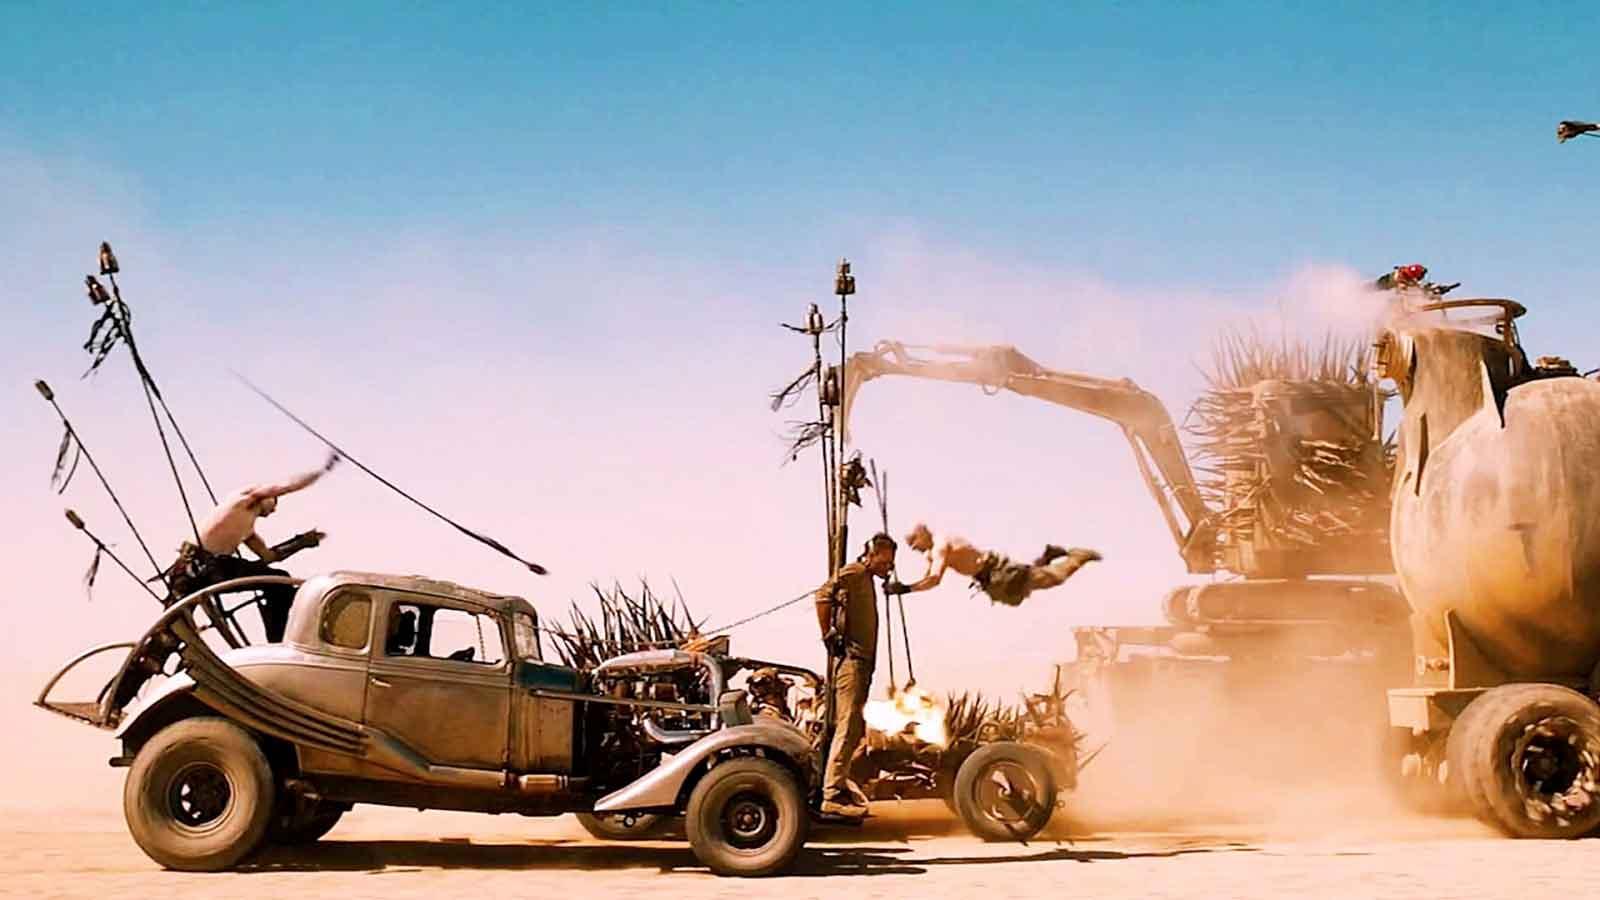 wacana-sinema-dunia-2015_15-mad-max-fury-road